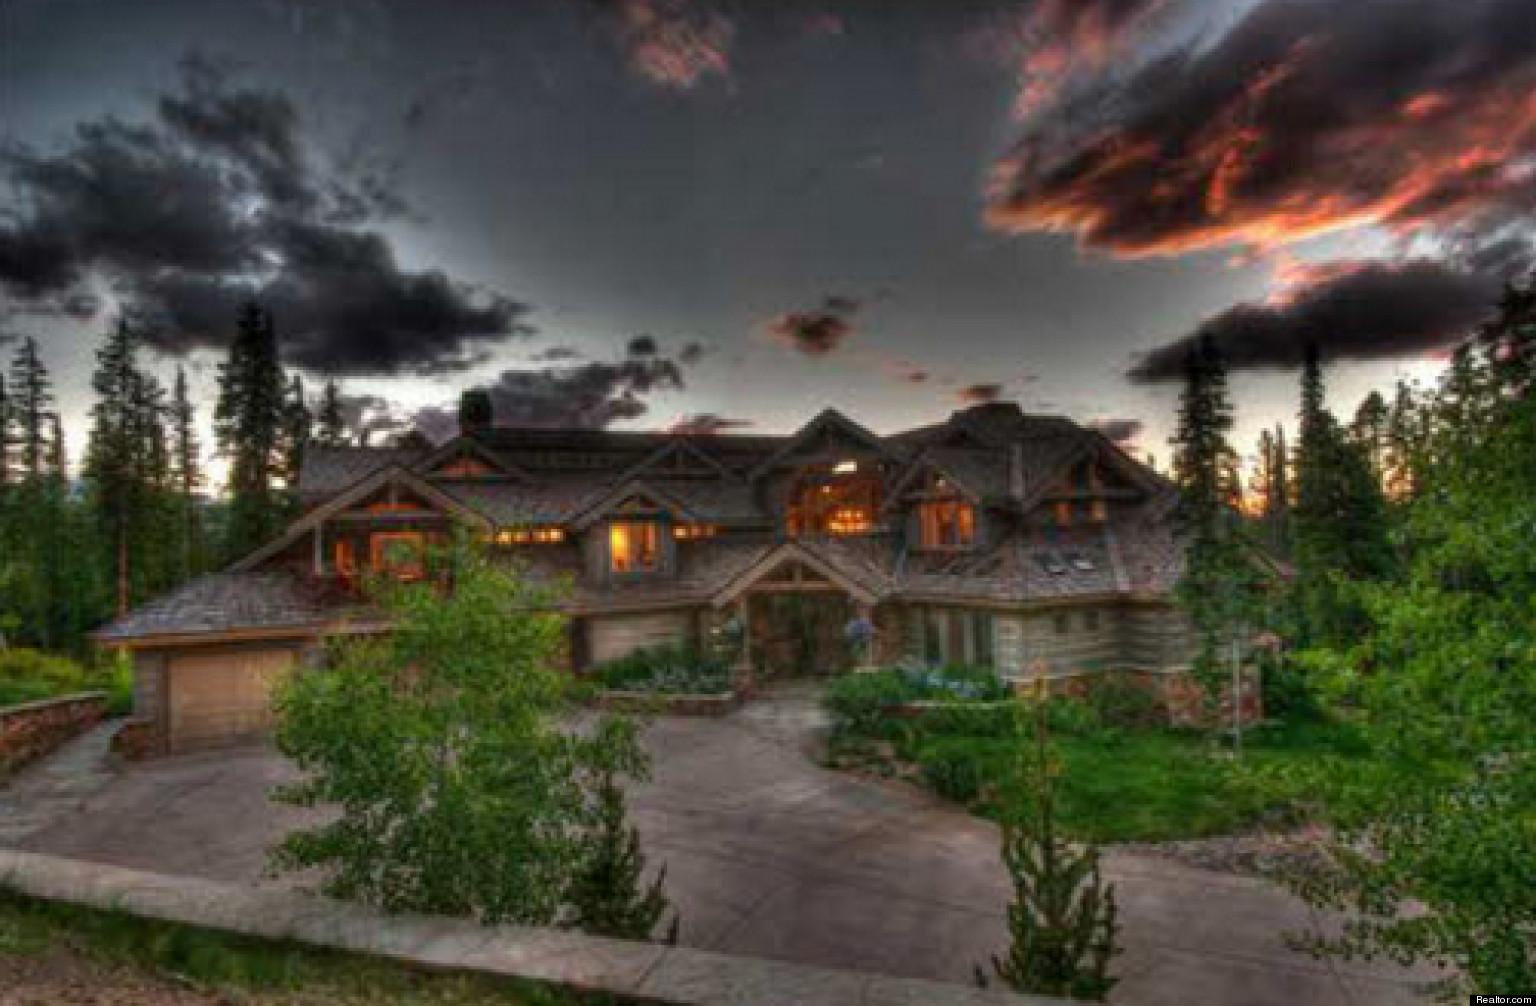 Top Luxury Colorado Homes To Have A Snow Day Inside PHOTOS - Colorado luxury homes